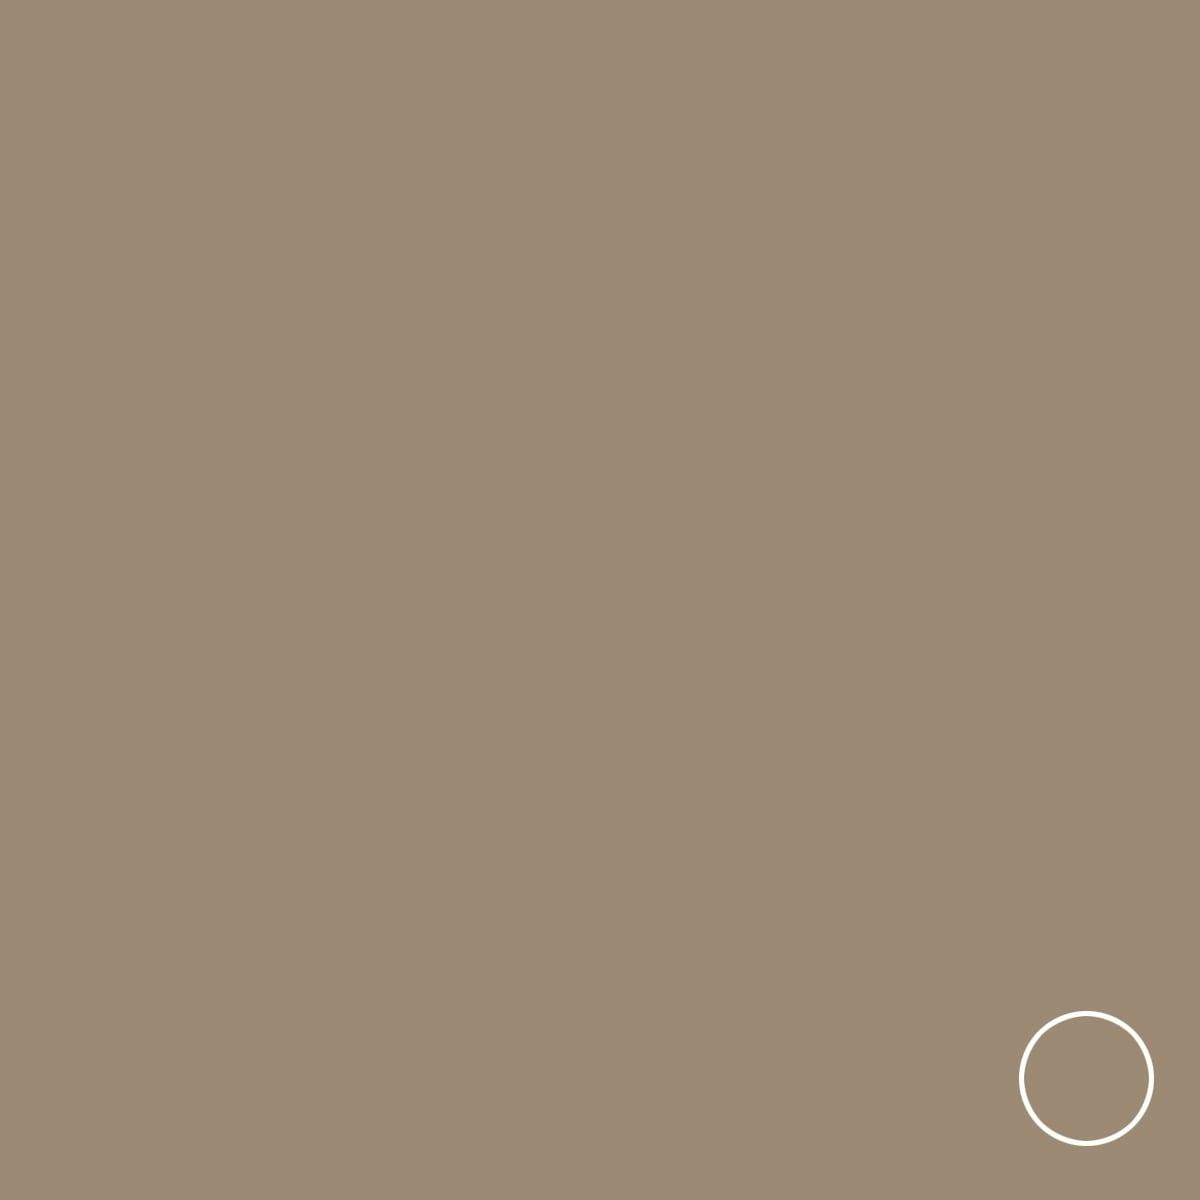 ORGANIC LINE (10ml) - PIGMENT CAMOUFLAGE 20 ORGANICLINE AMIEA (10 ml)